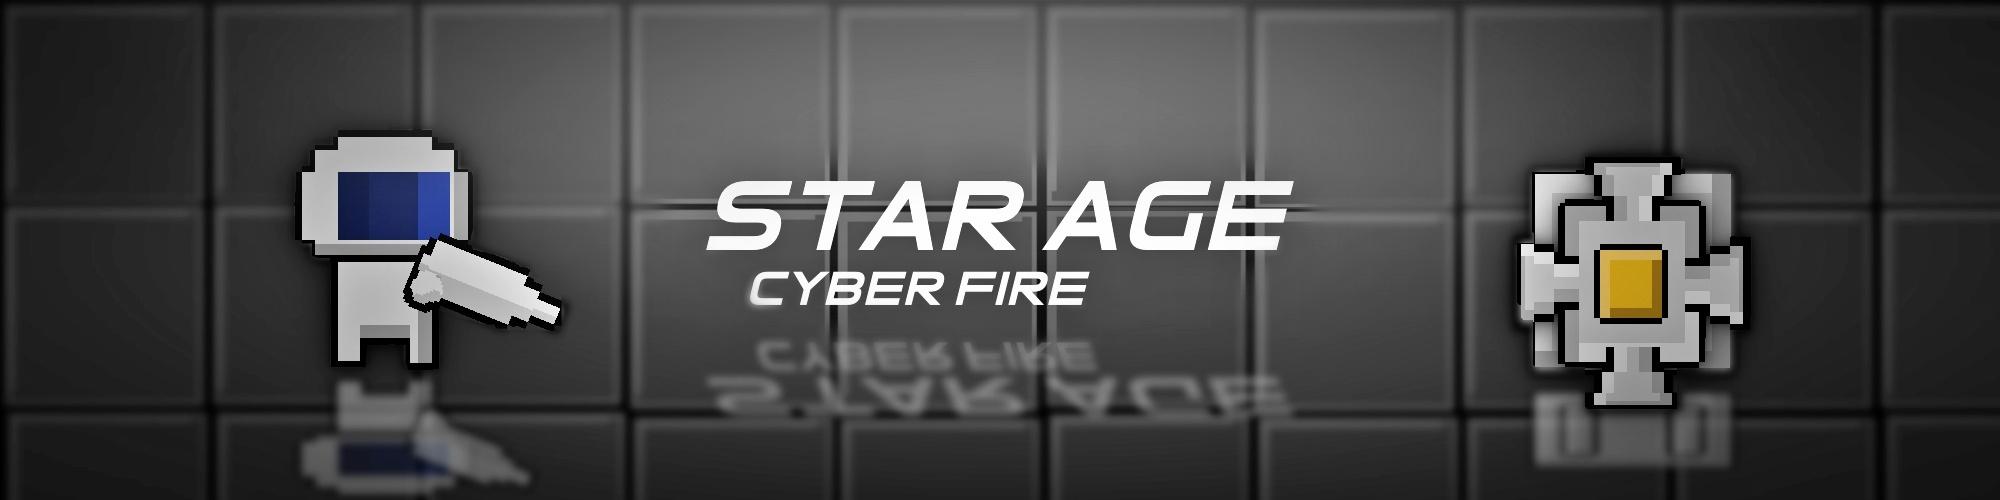 Star Age: Cyberfire